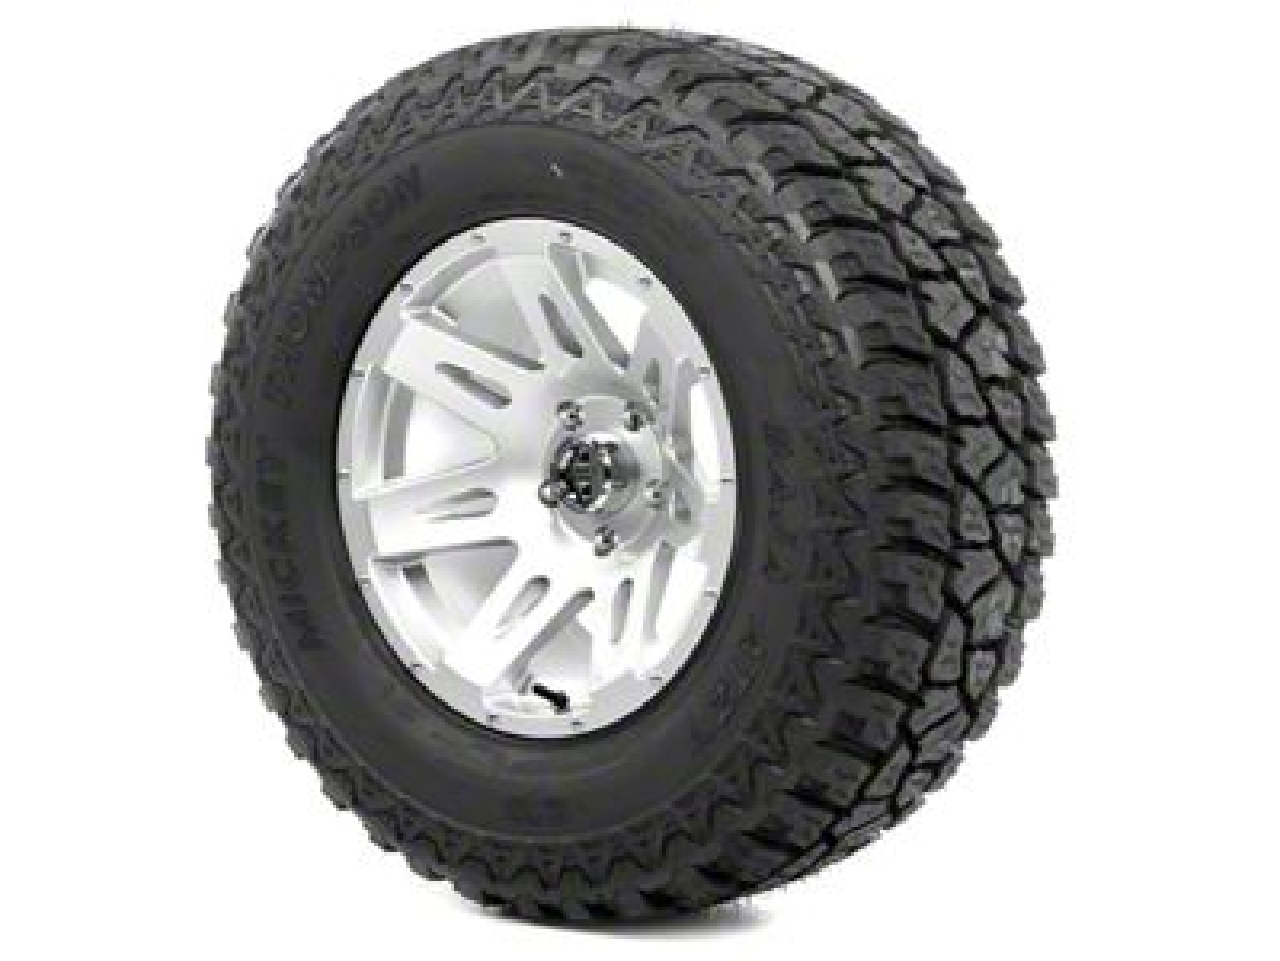 Rugged Ridge XHD Wheel 17x9 Silver and Mickey Thompson ATZ P3 315/70R17 Tire Kit (13-18 Jeep Wrangler JK; 2018 Jeep Wrangler JL)